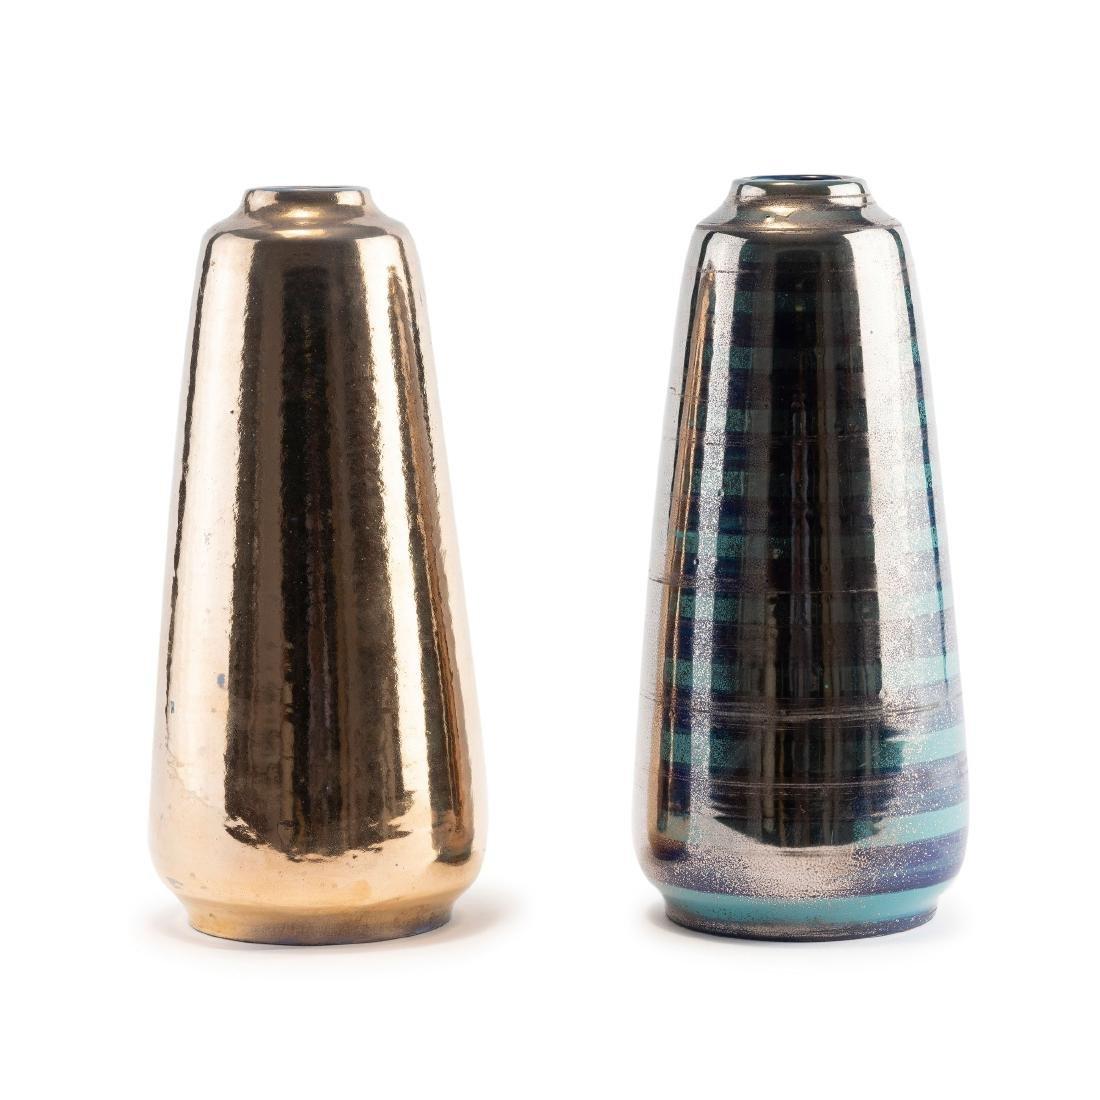 Two vases, 1950s